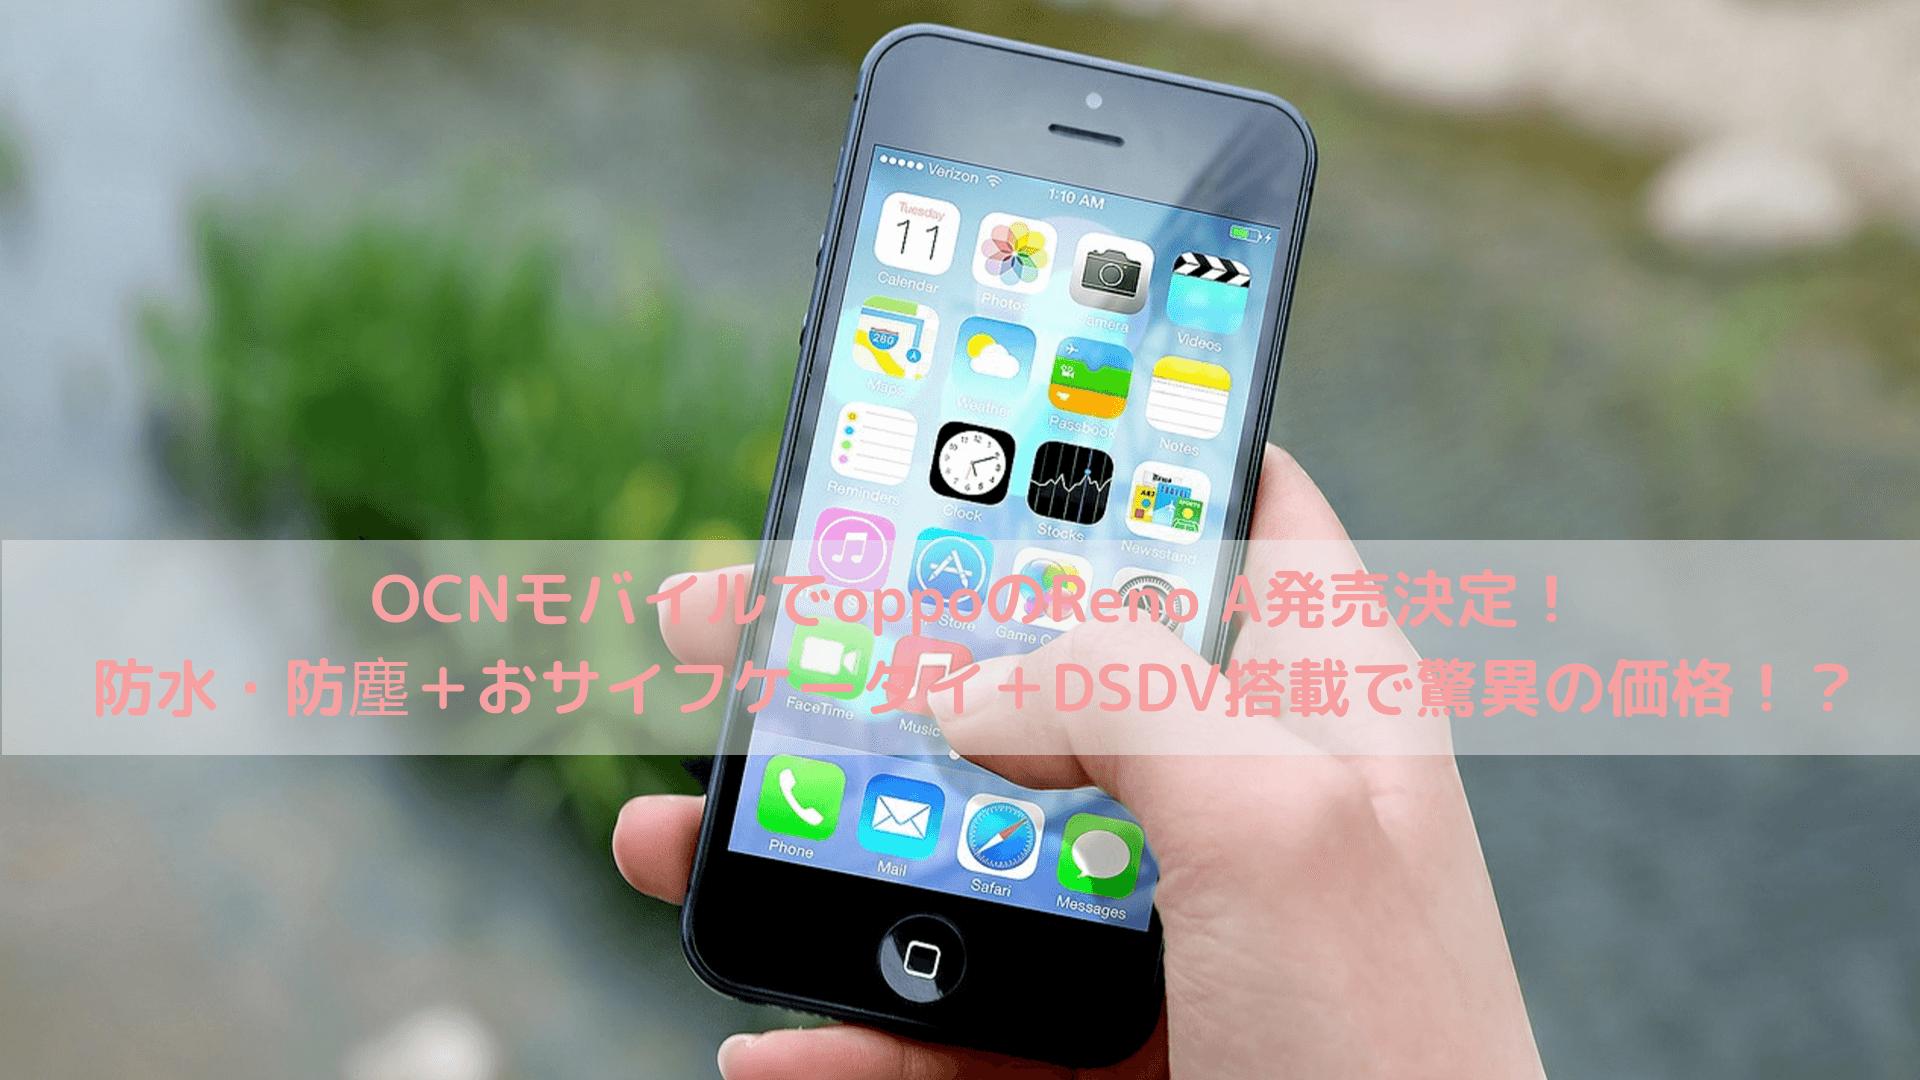 OCNモバイルでoppoのReno A発売決定!防水・防塵+おサイフケータイ+DSDV搭載で驚異の価格!?